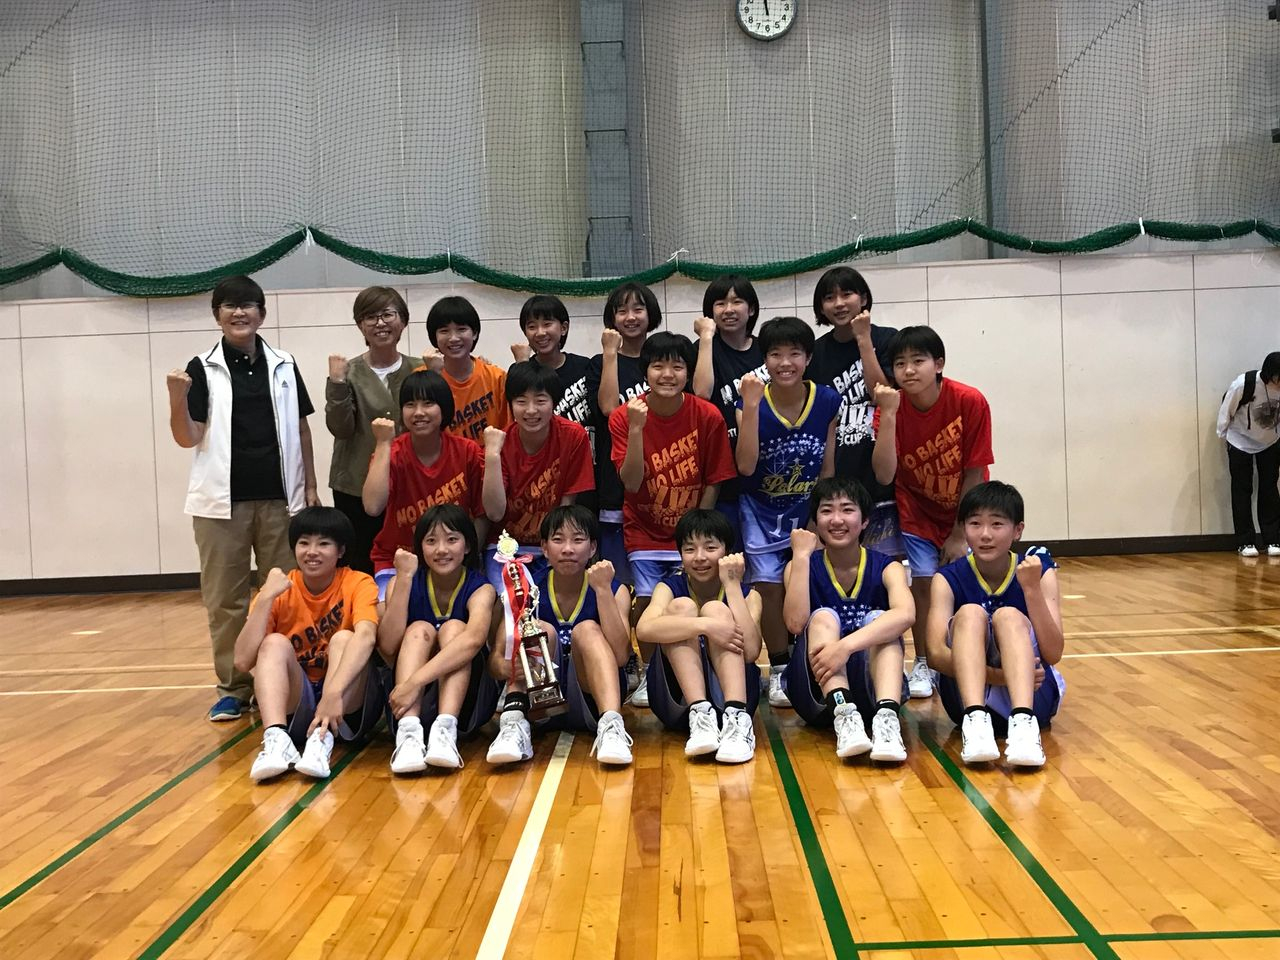 長野カップ女子強化 優勝